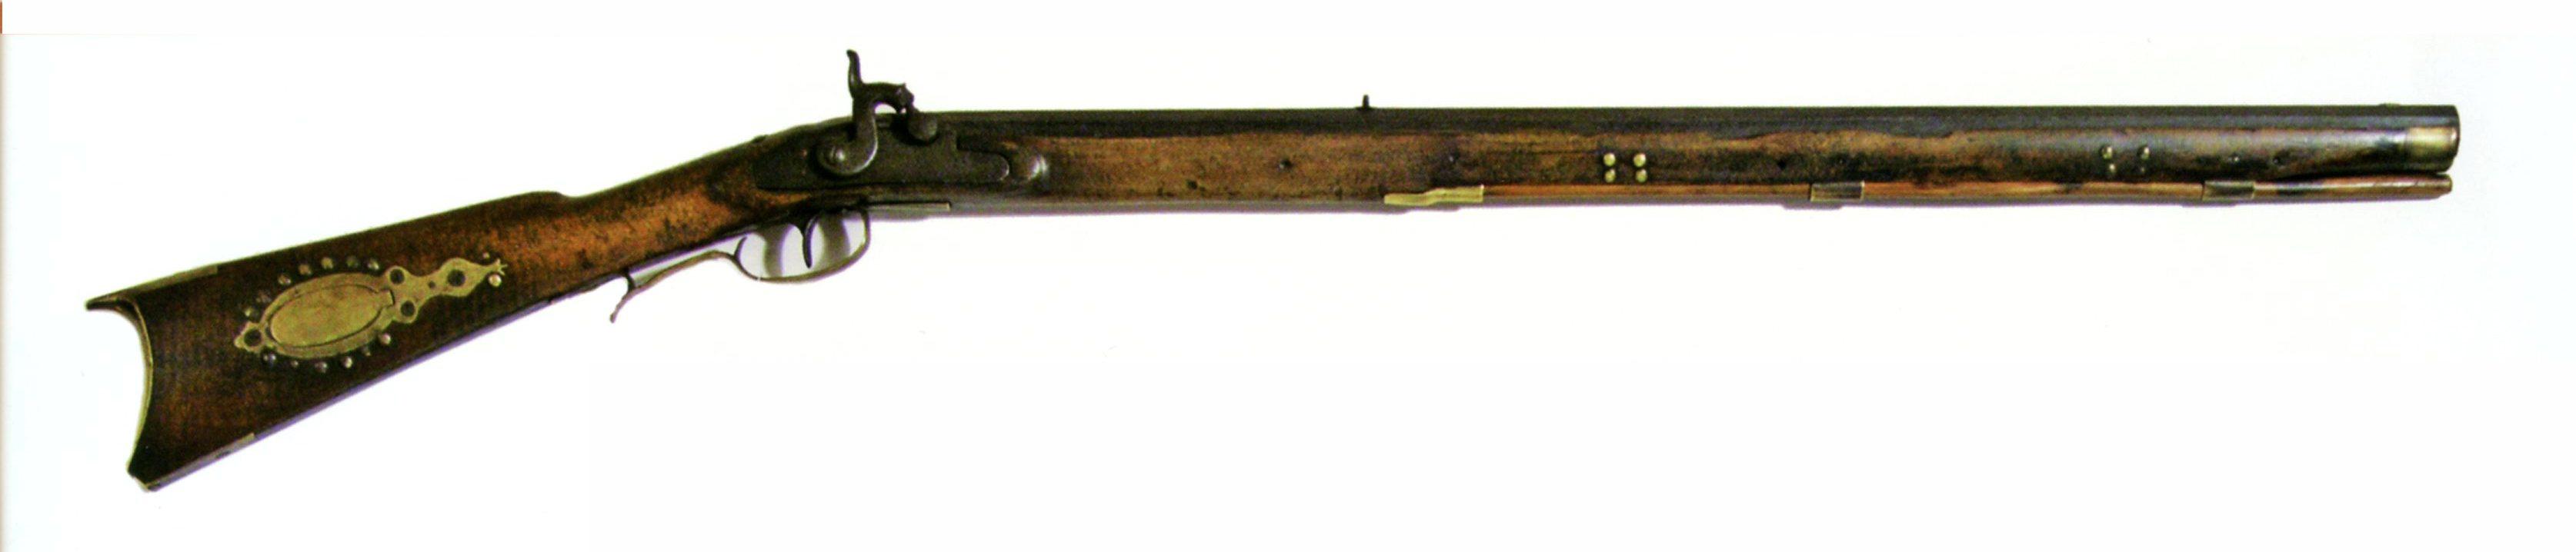 Leman Indian Rifle – GRRW Collector